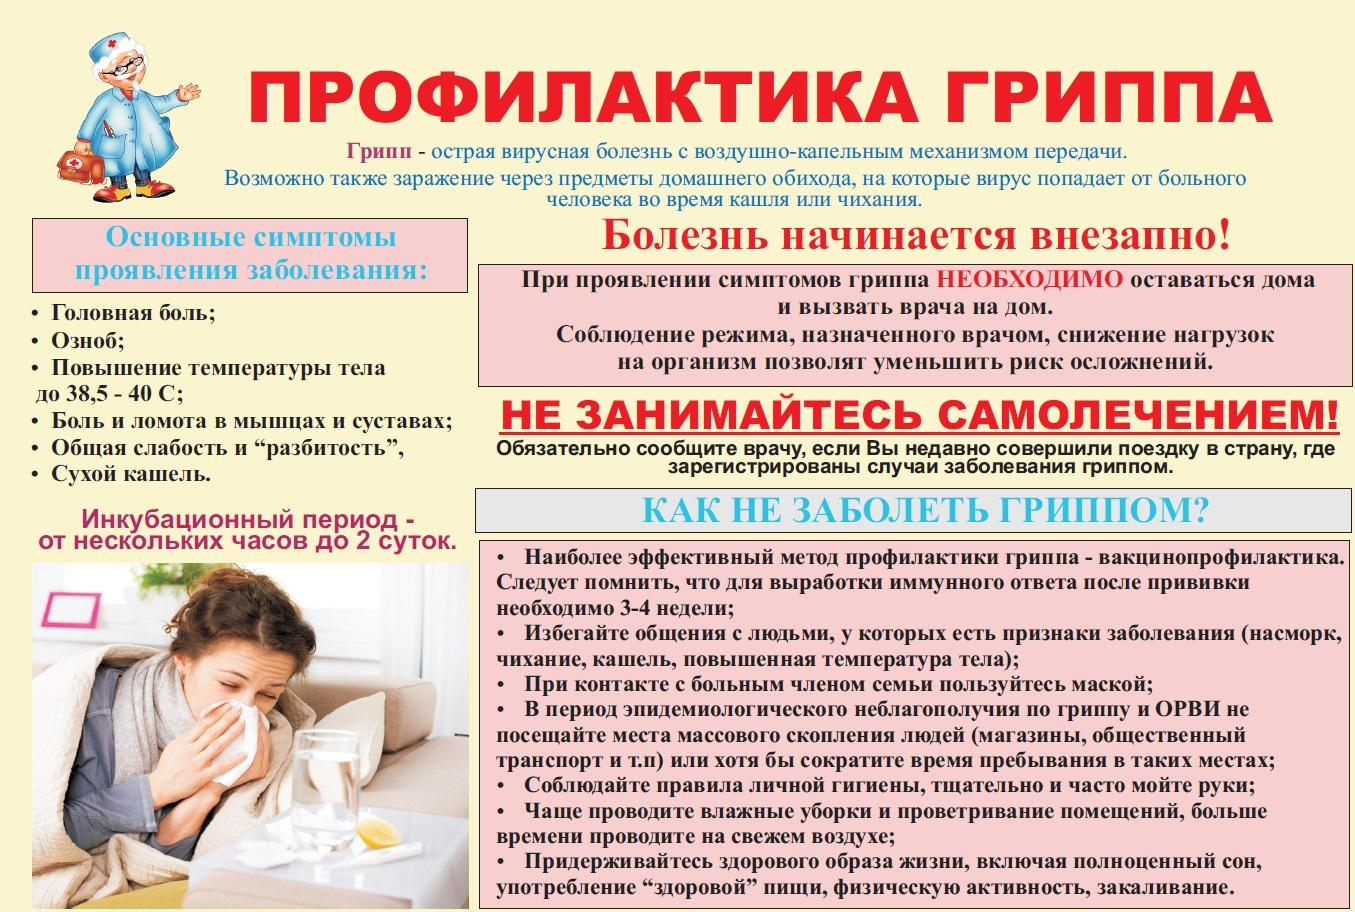 https://rstatic.oshkole.ru/editor_images/113268.jpg